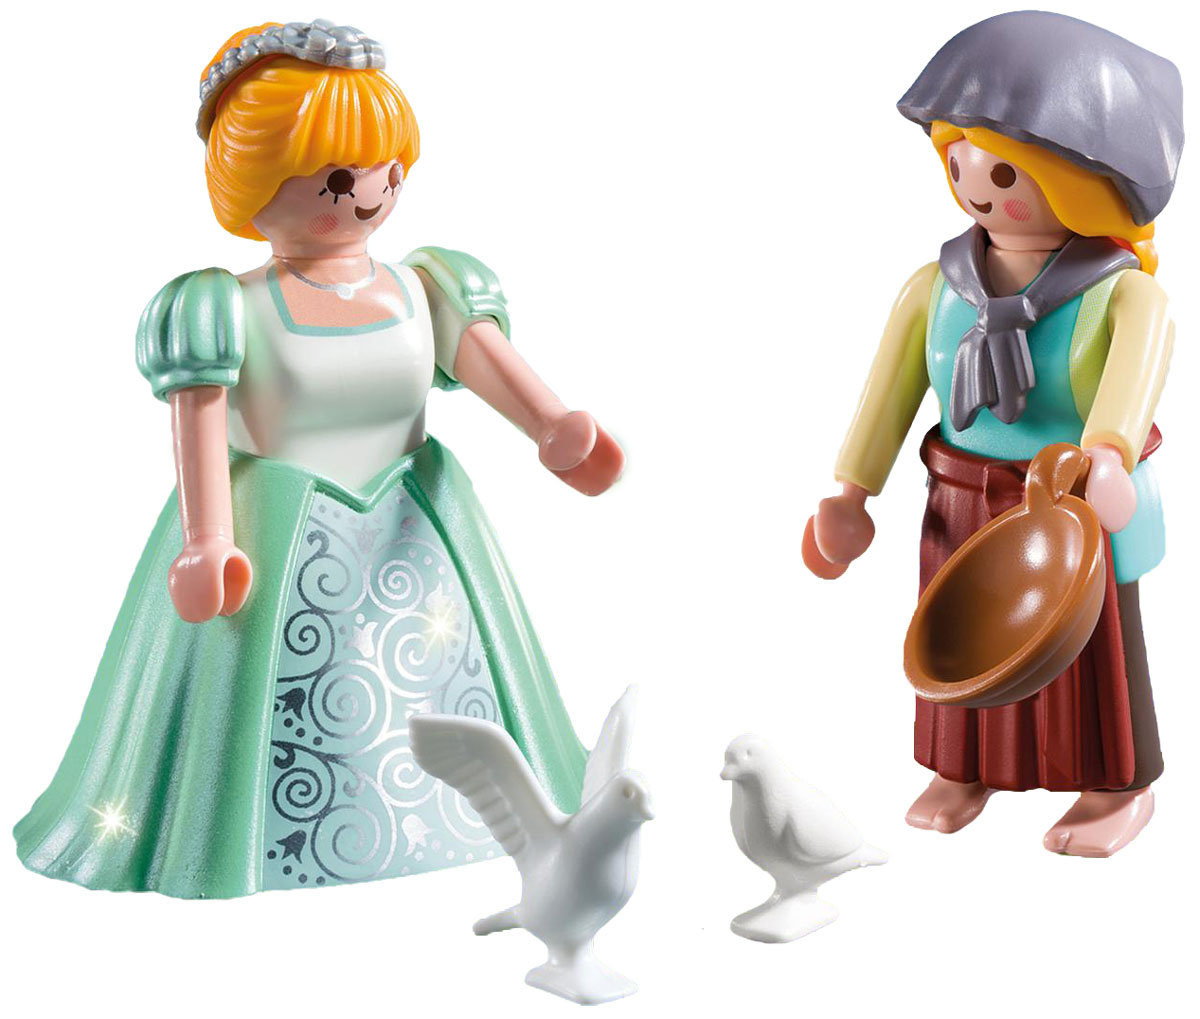 Playmobil Игровой набор Принцесса и служанка принцесса xxl playmobil